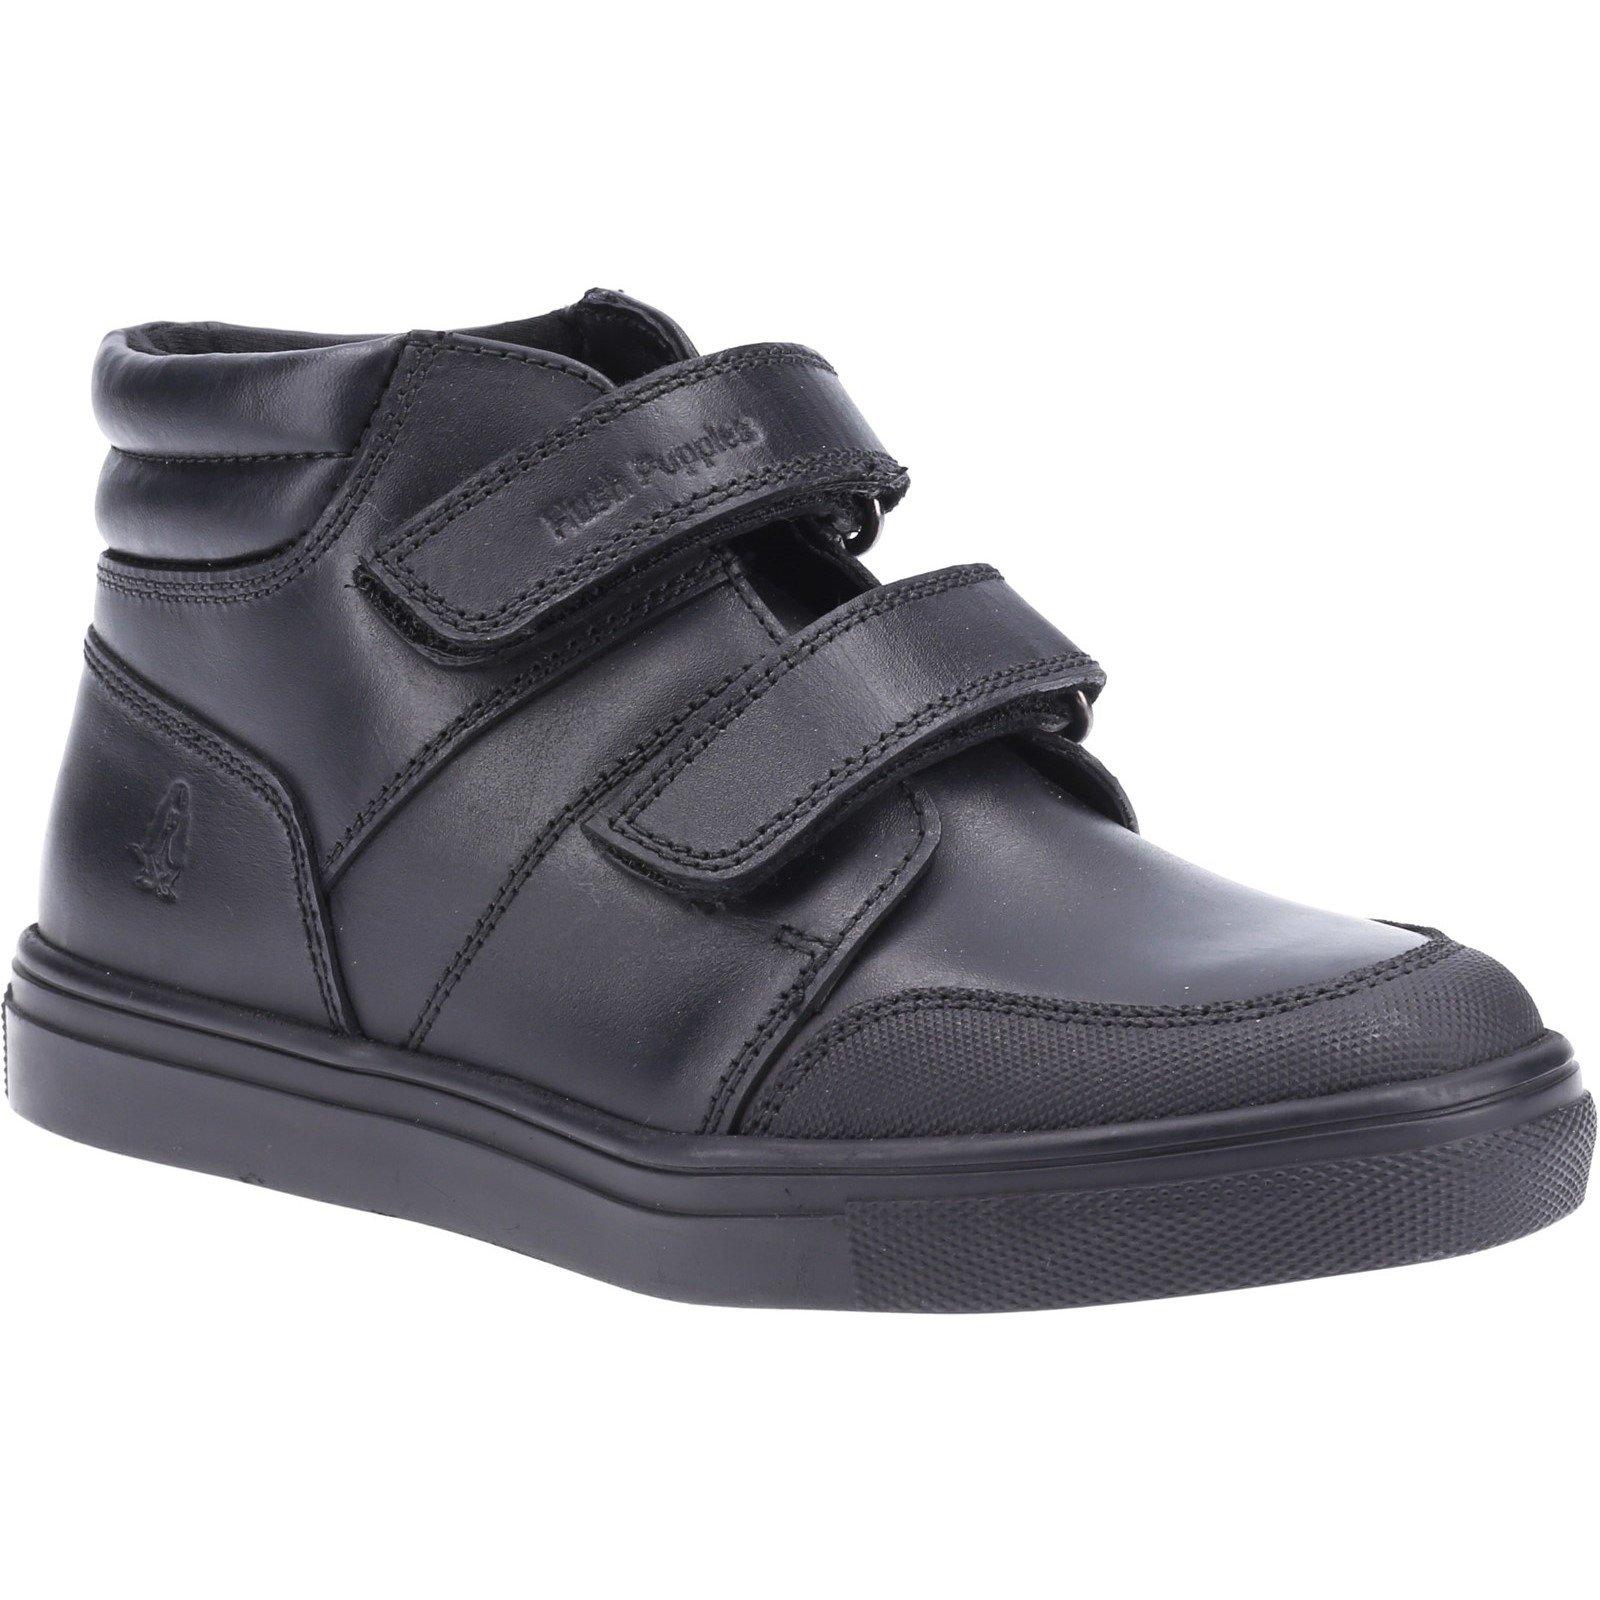 Hush Puppies Kid's Seth Junior Boot Black 32570 - Black 11